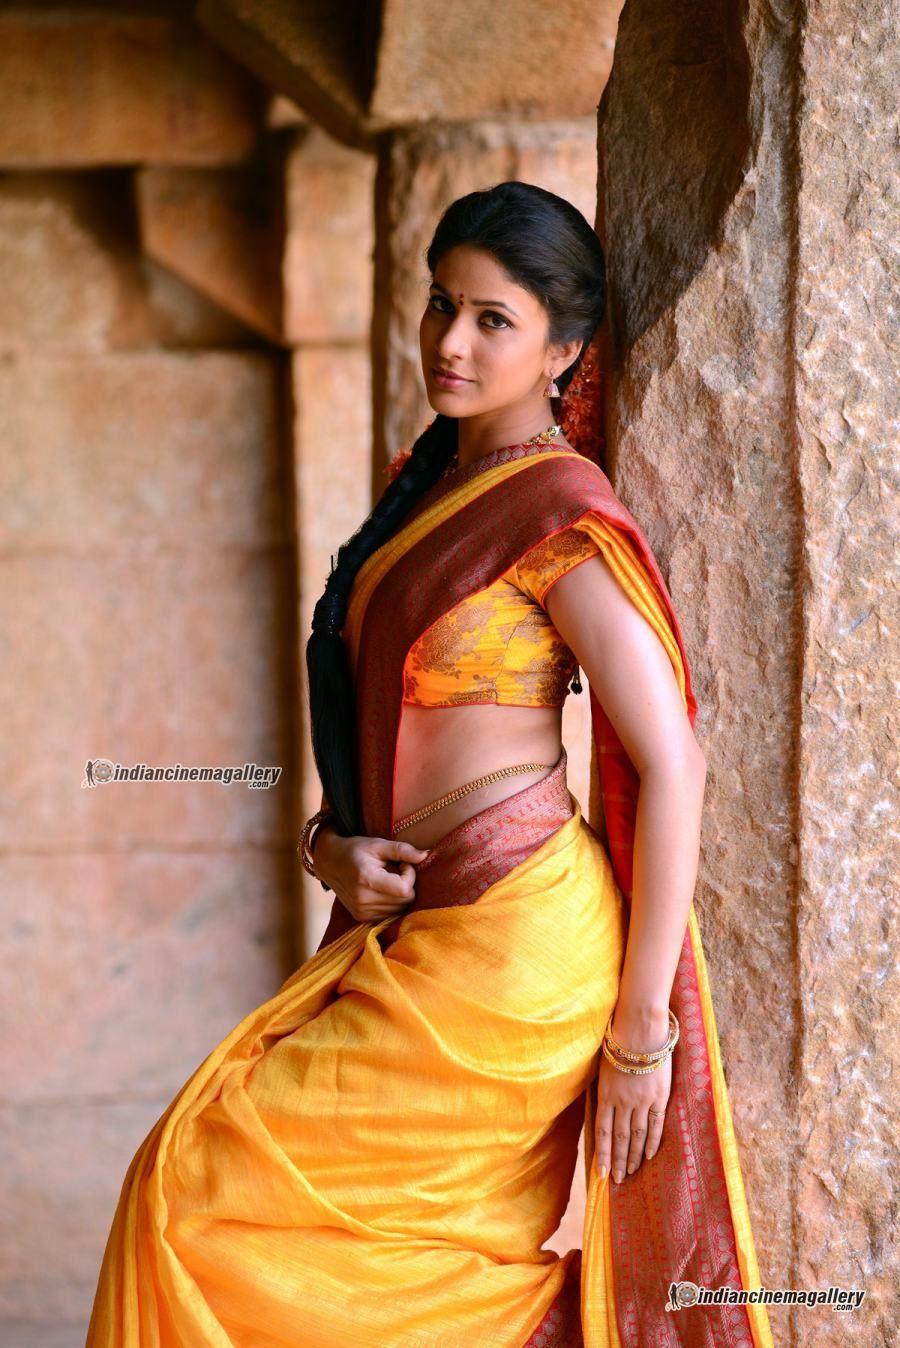 Nude Priyanka Gandhi Delightful lavanya tripathi in sokkali mainar movie (8) | adorable